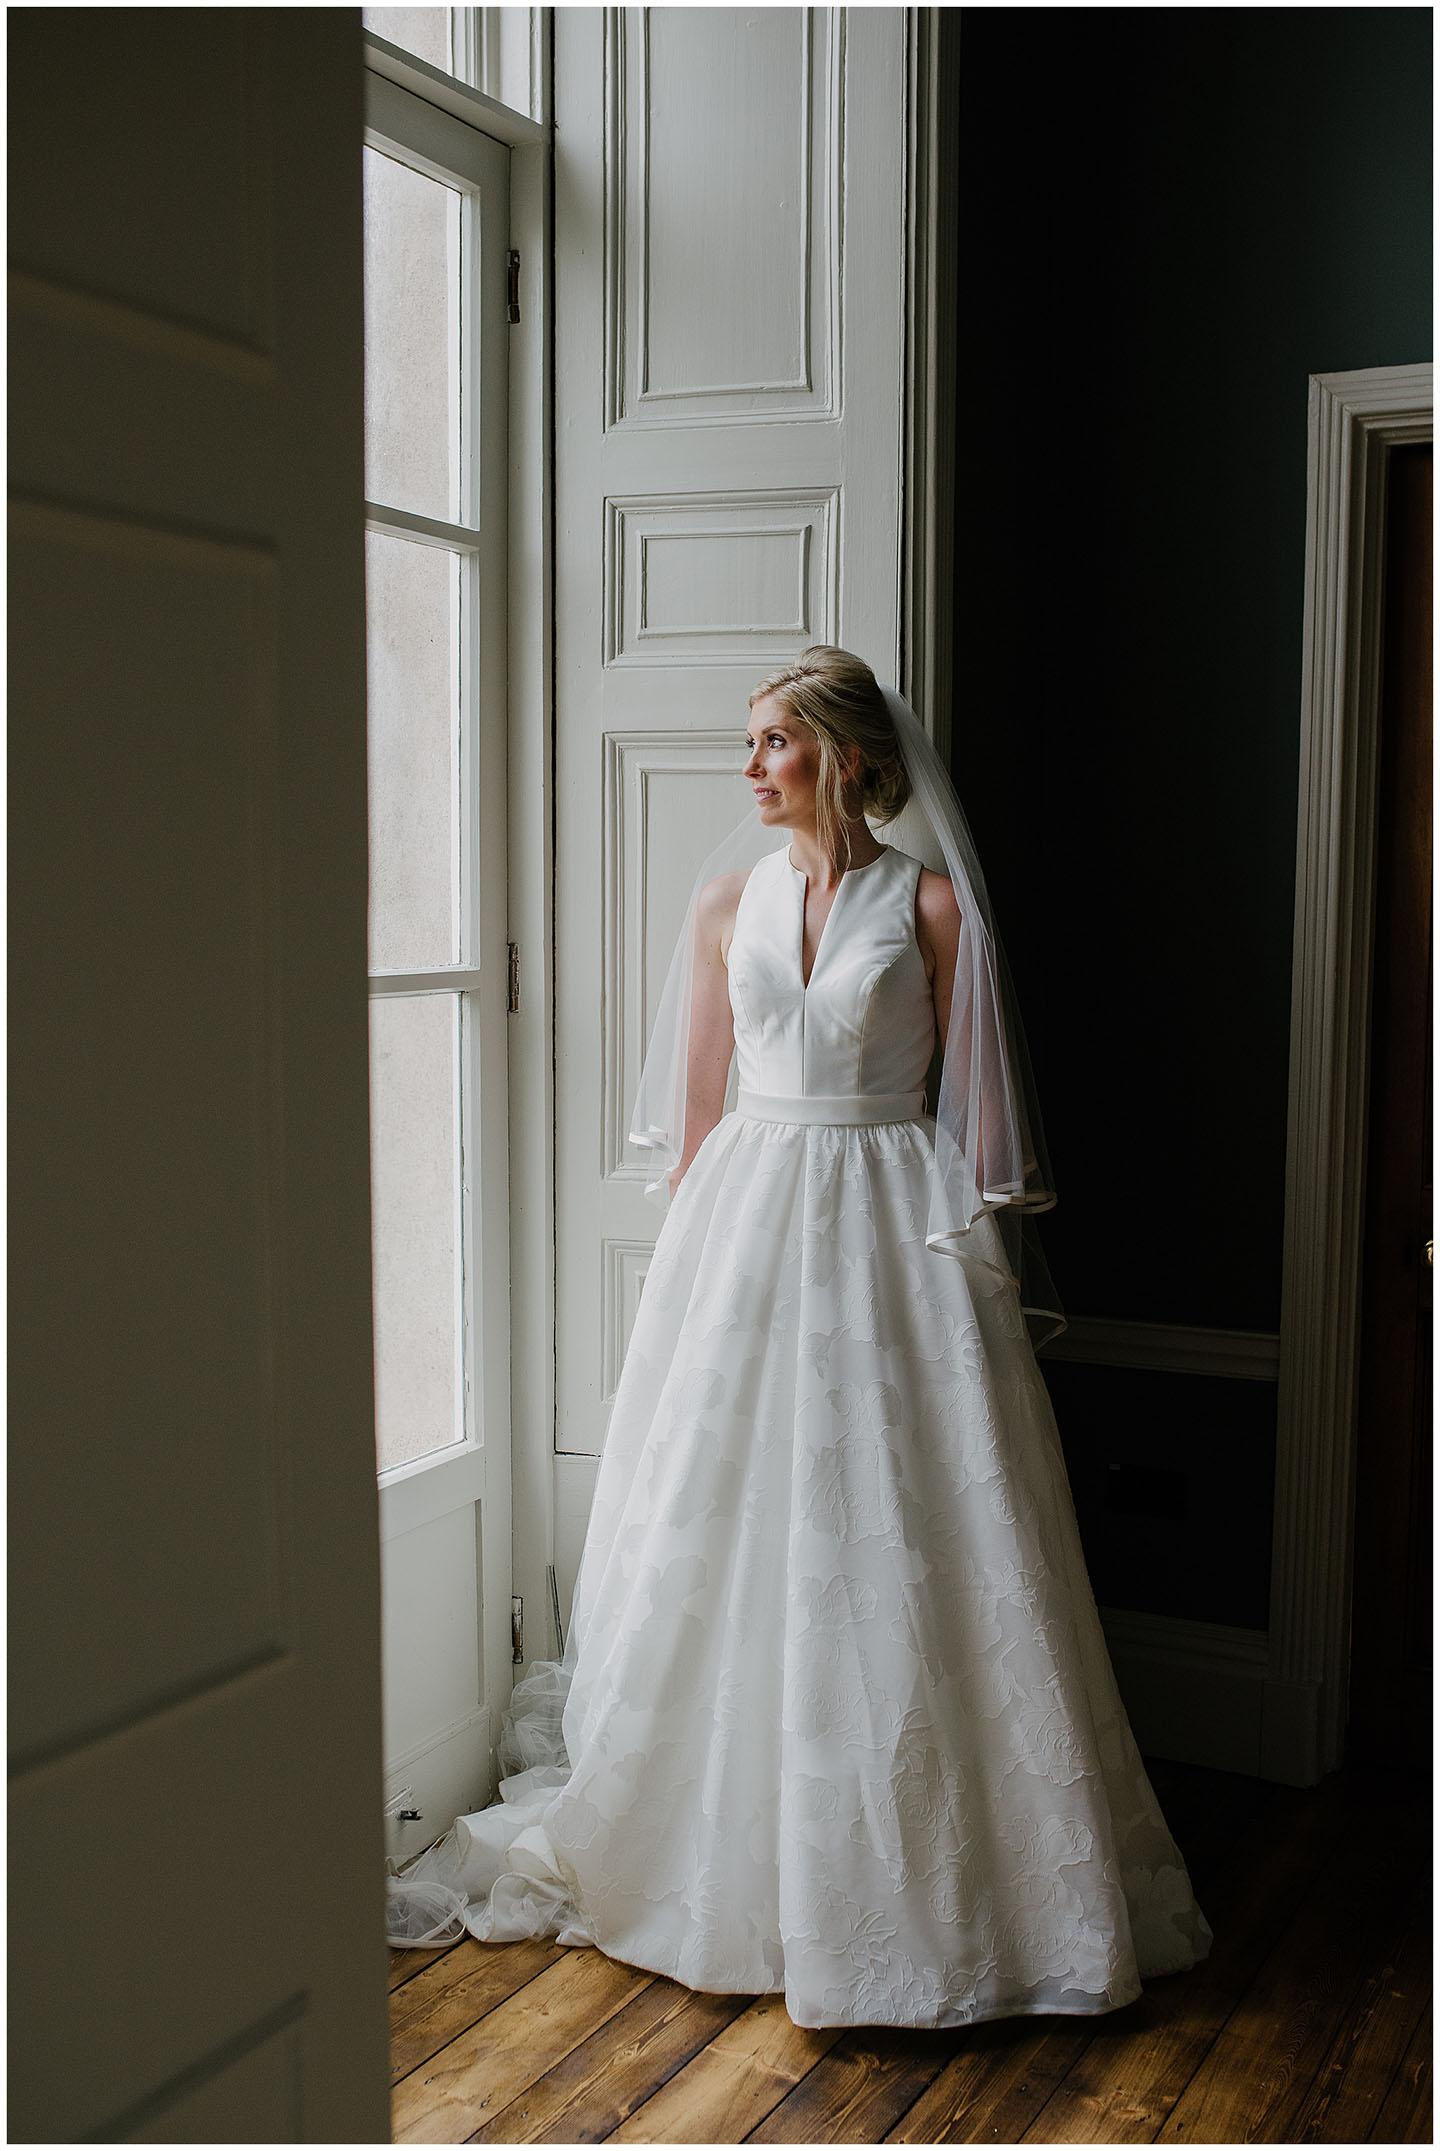 farnham-estate-wedding-jude-browne-photography_0143.jpg